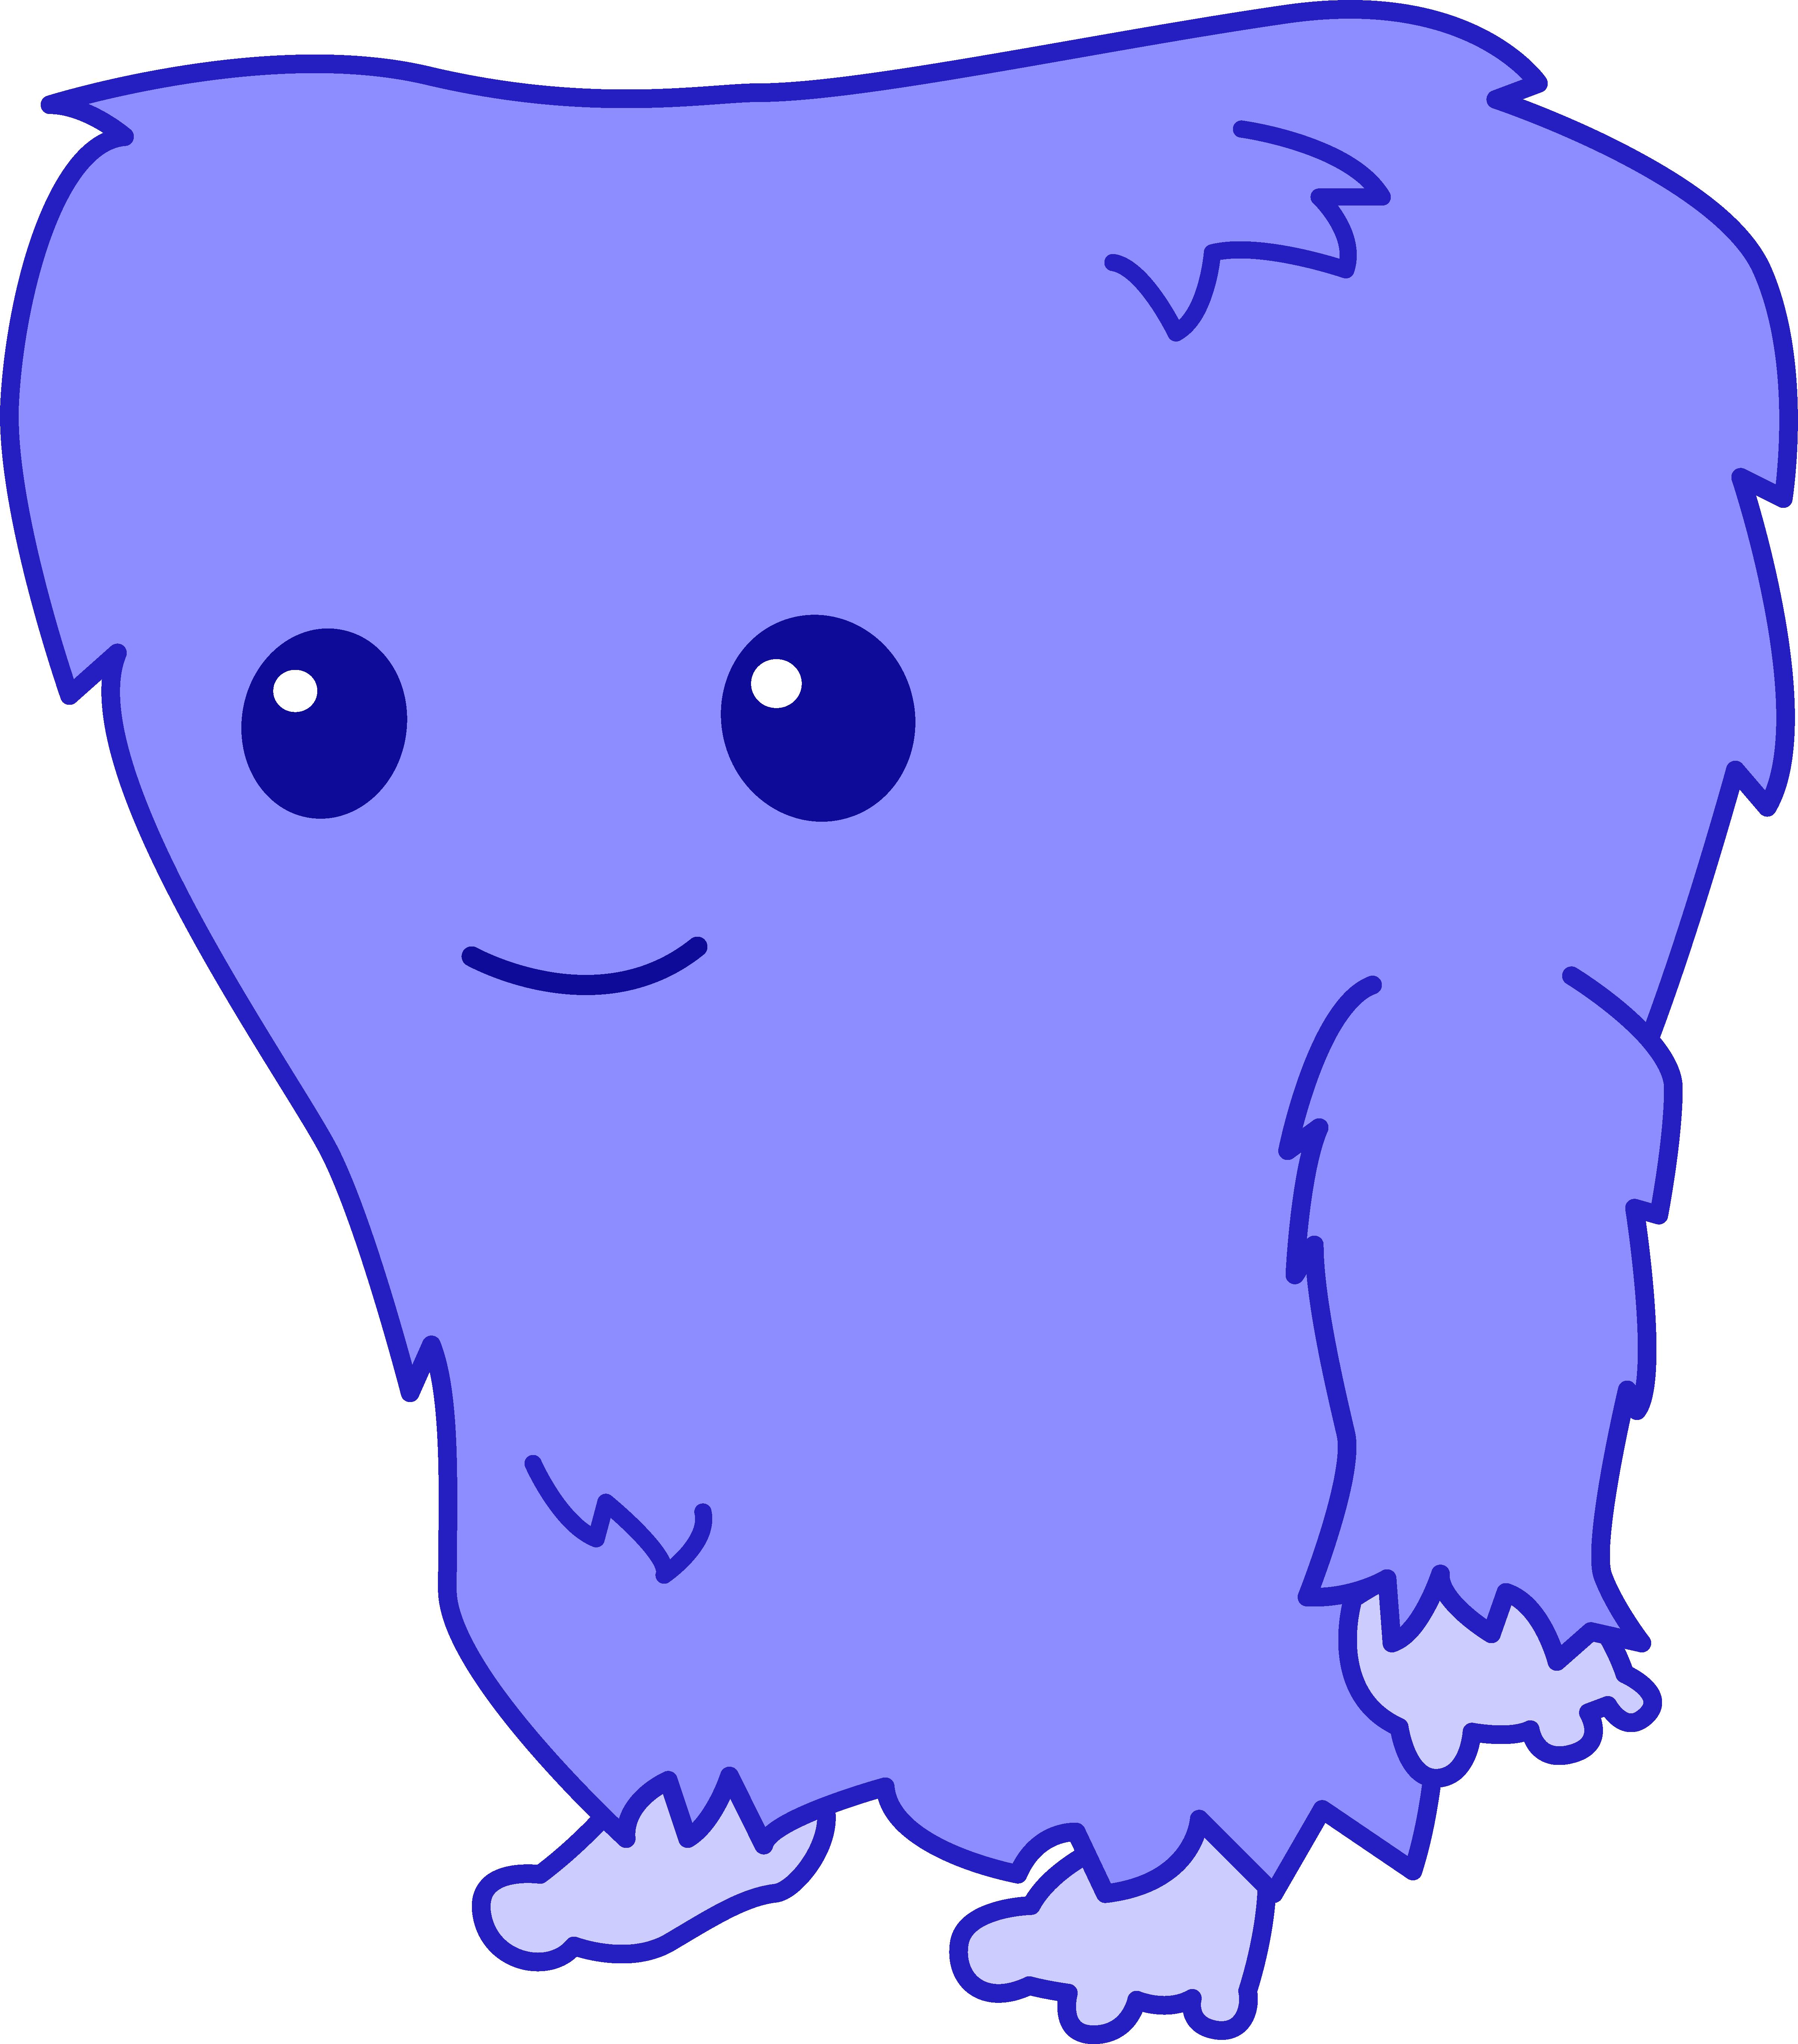 Cute Fuzzy Blue Monster.